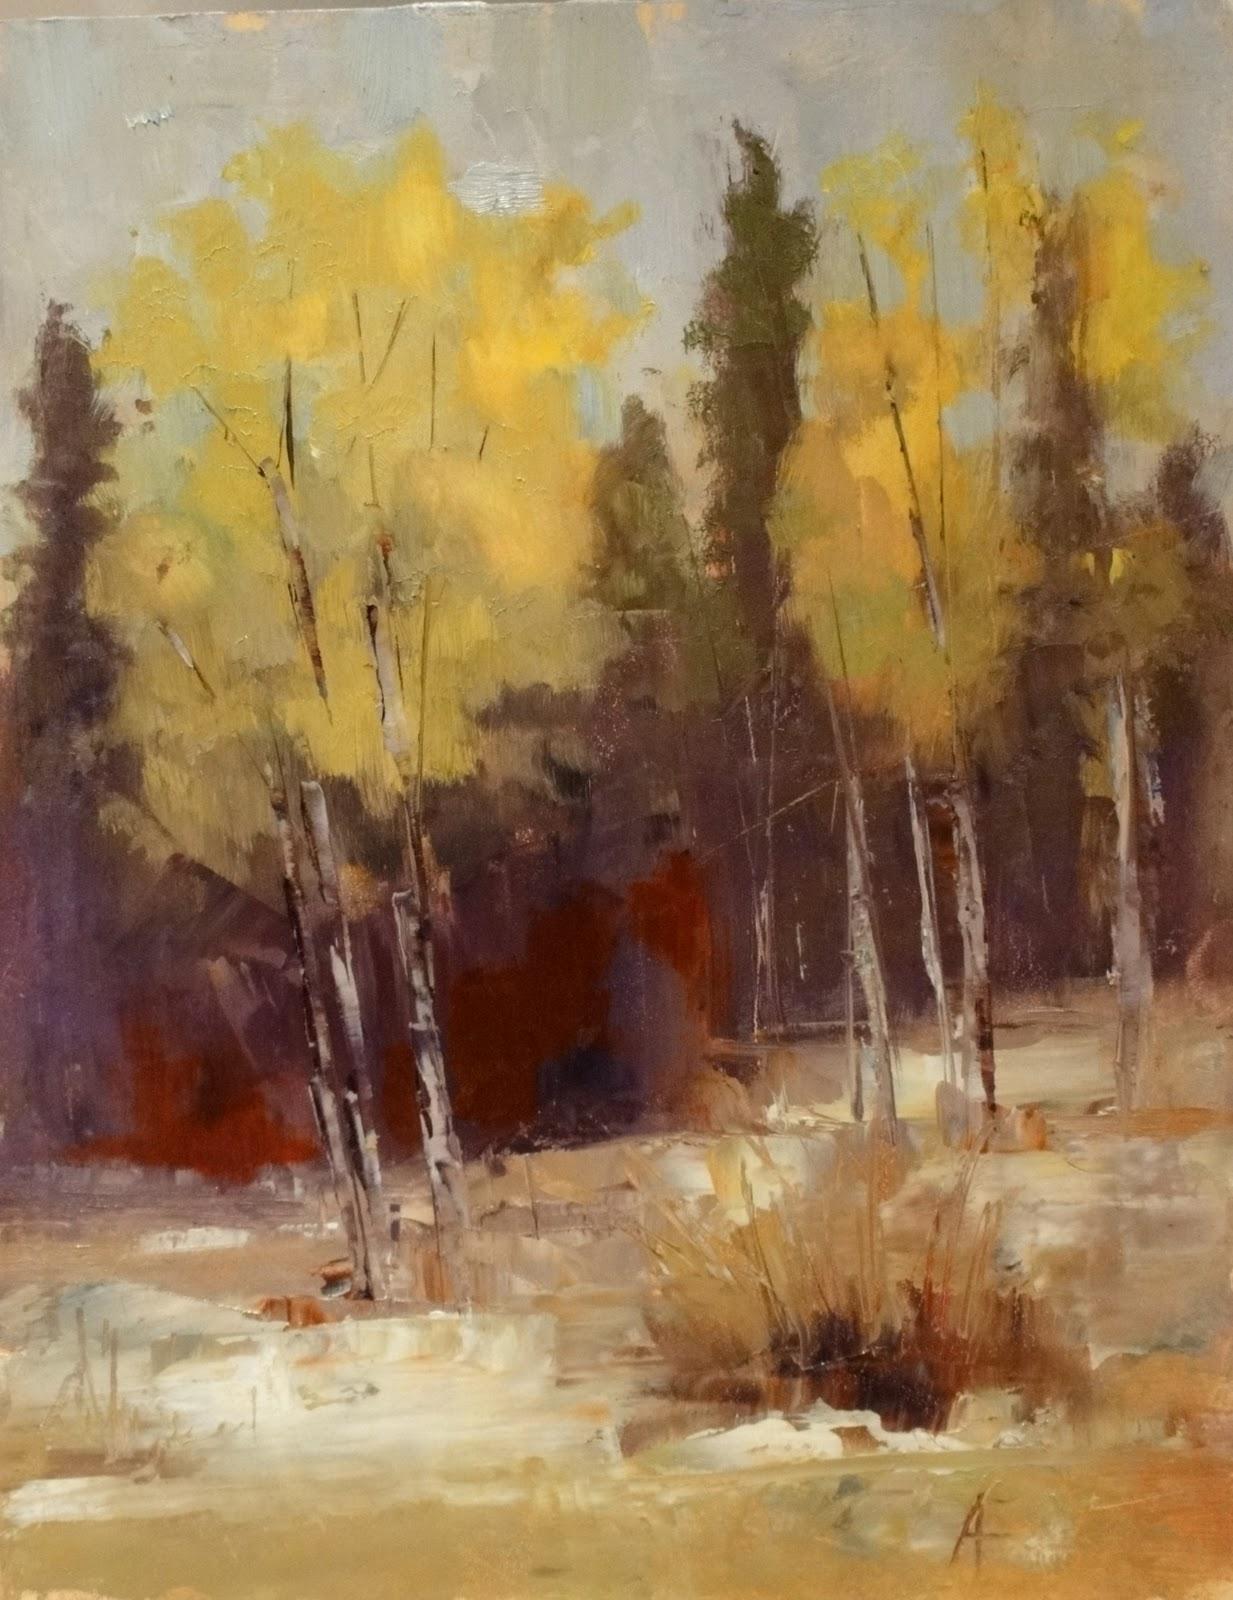 """Aspens in the Snow, 8x10"" original fine art by Ann Feldman"